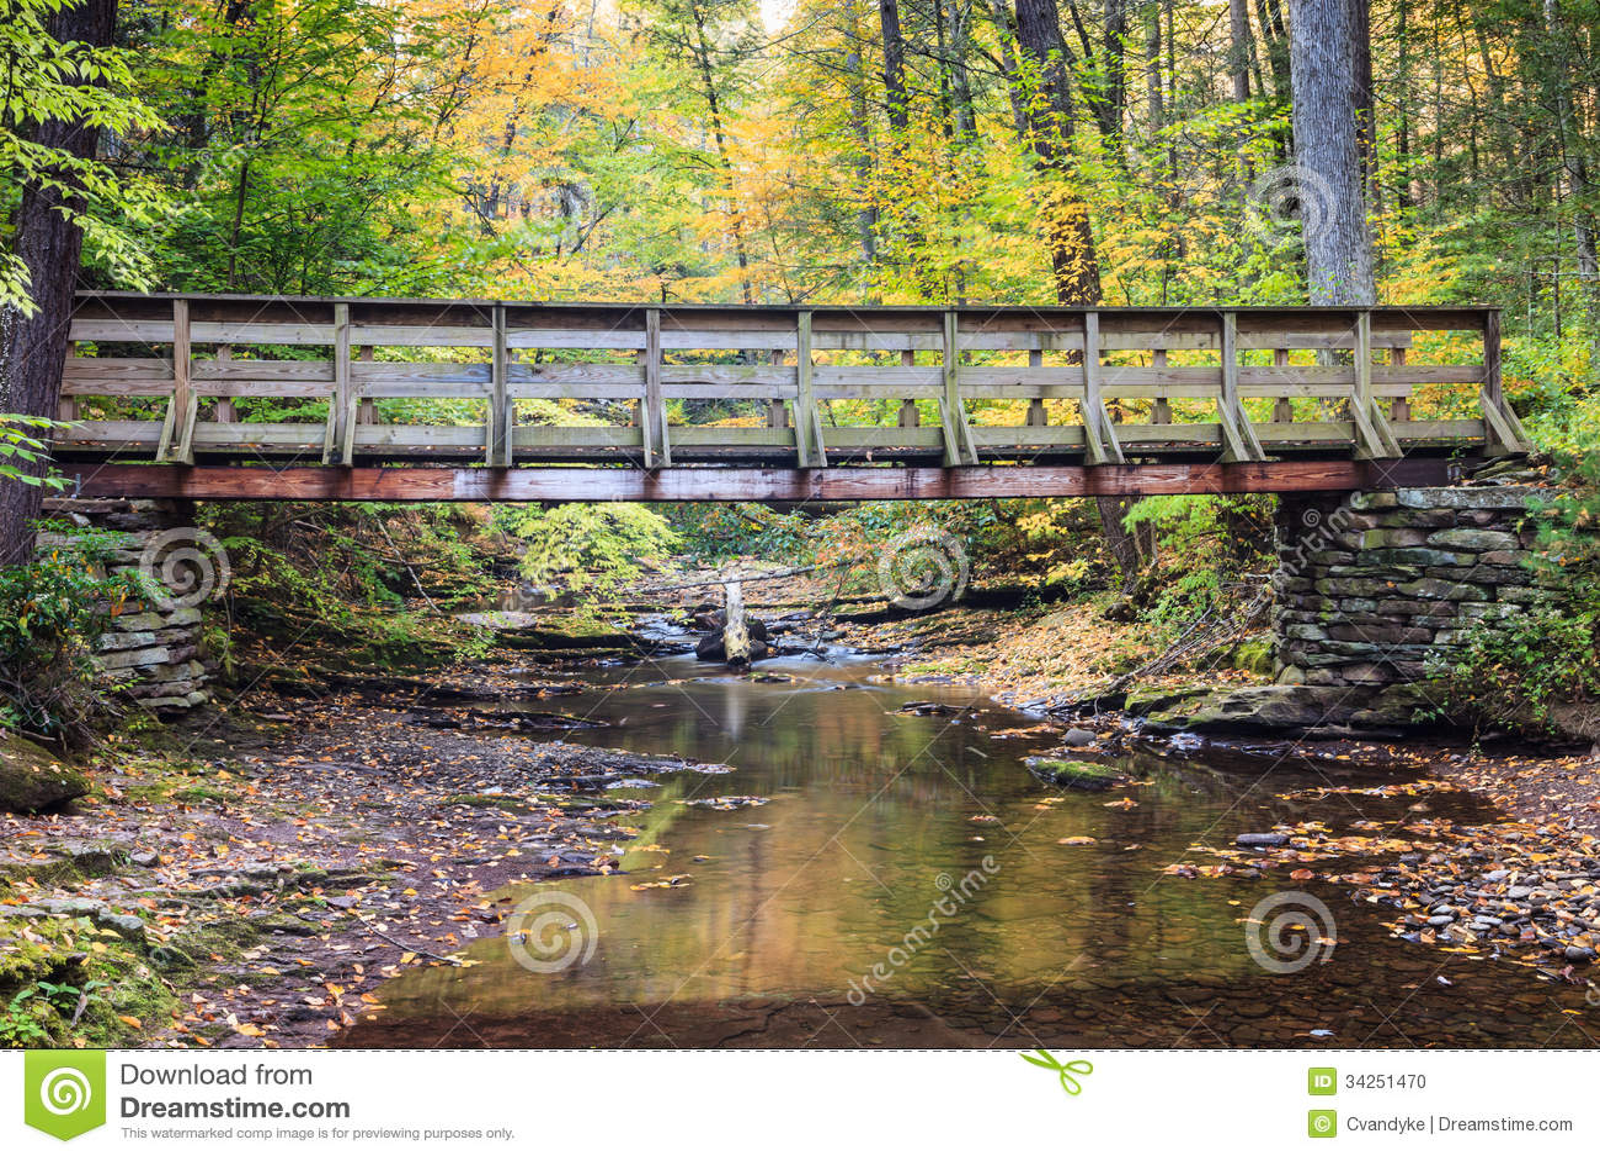 Pennsylvania Bridge Over Creek in Autumn